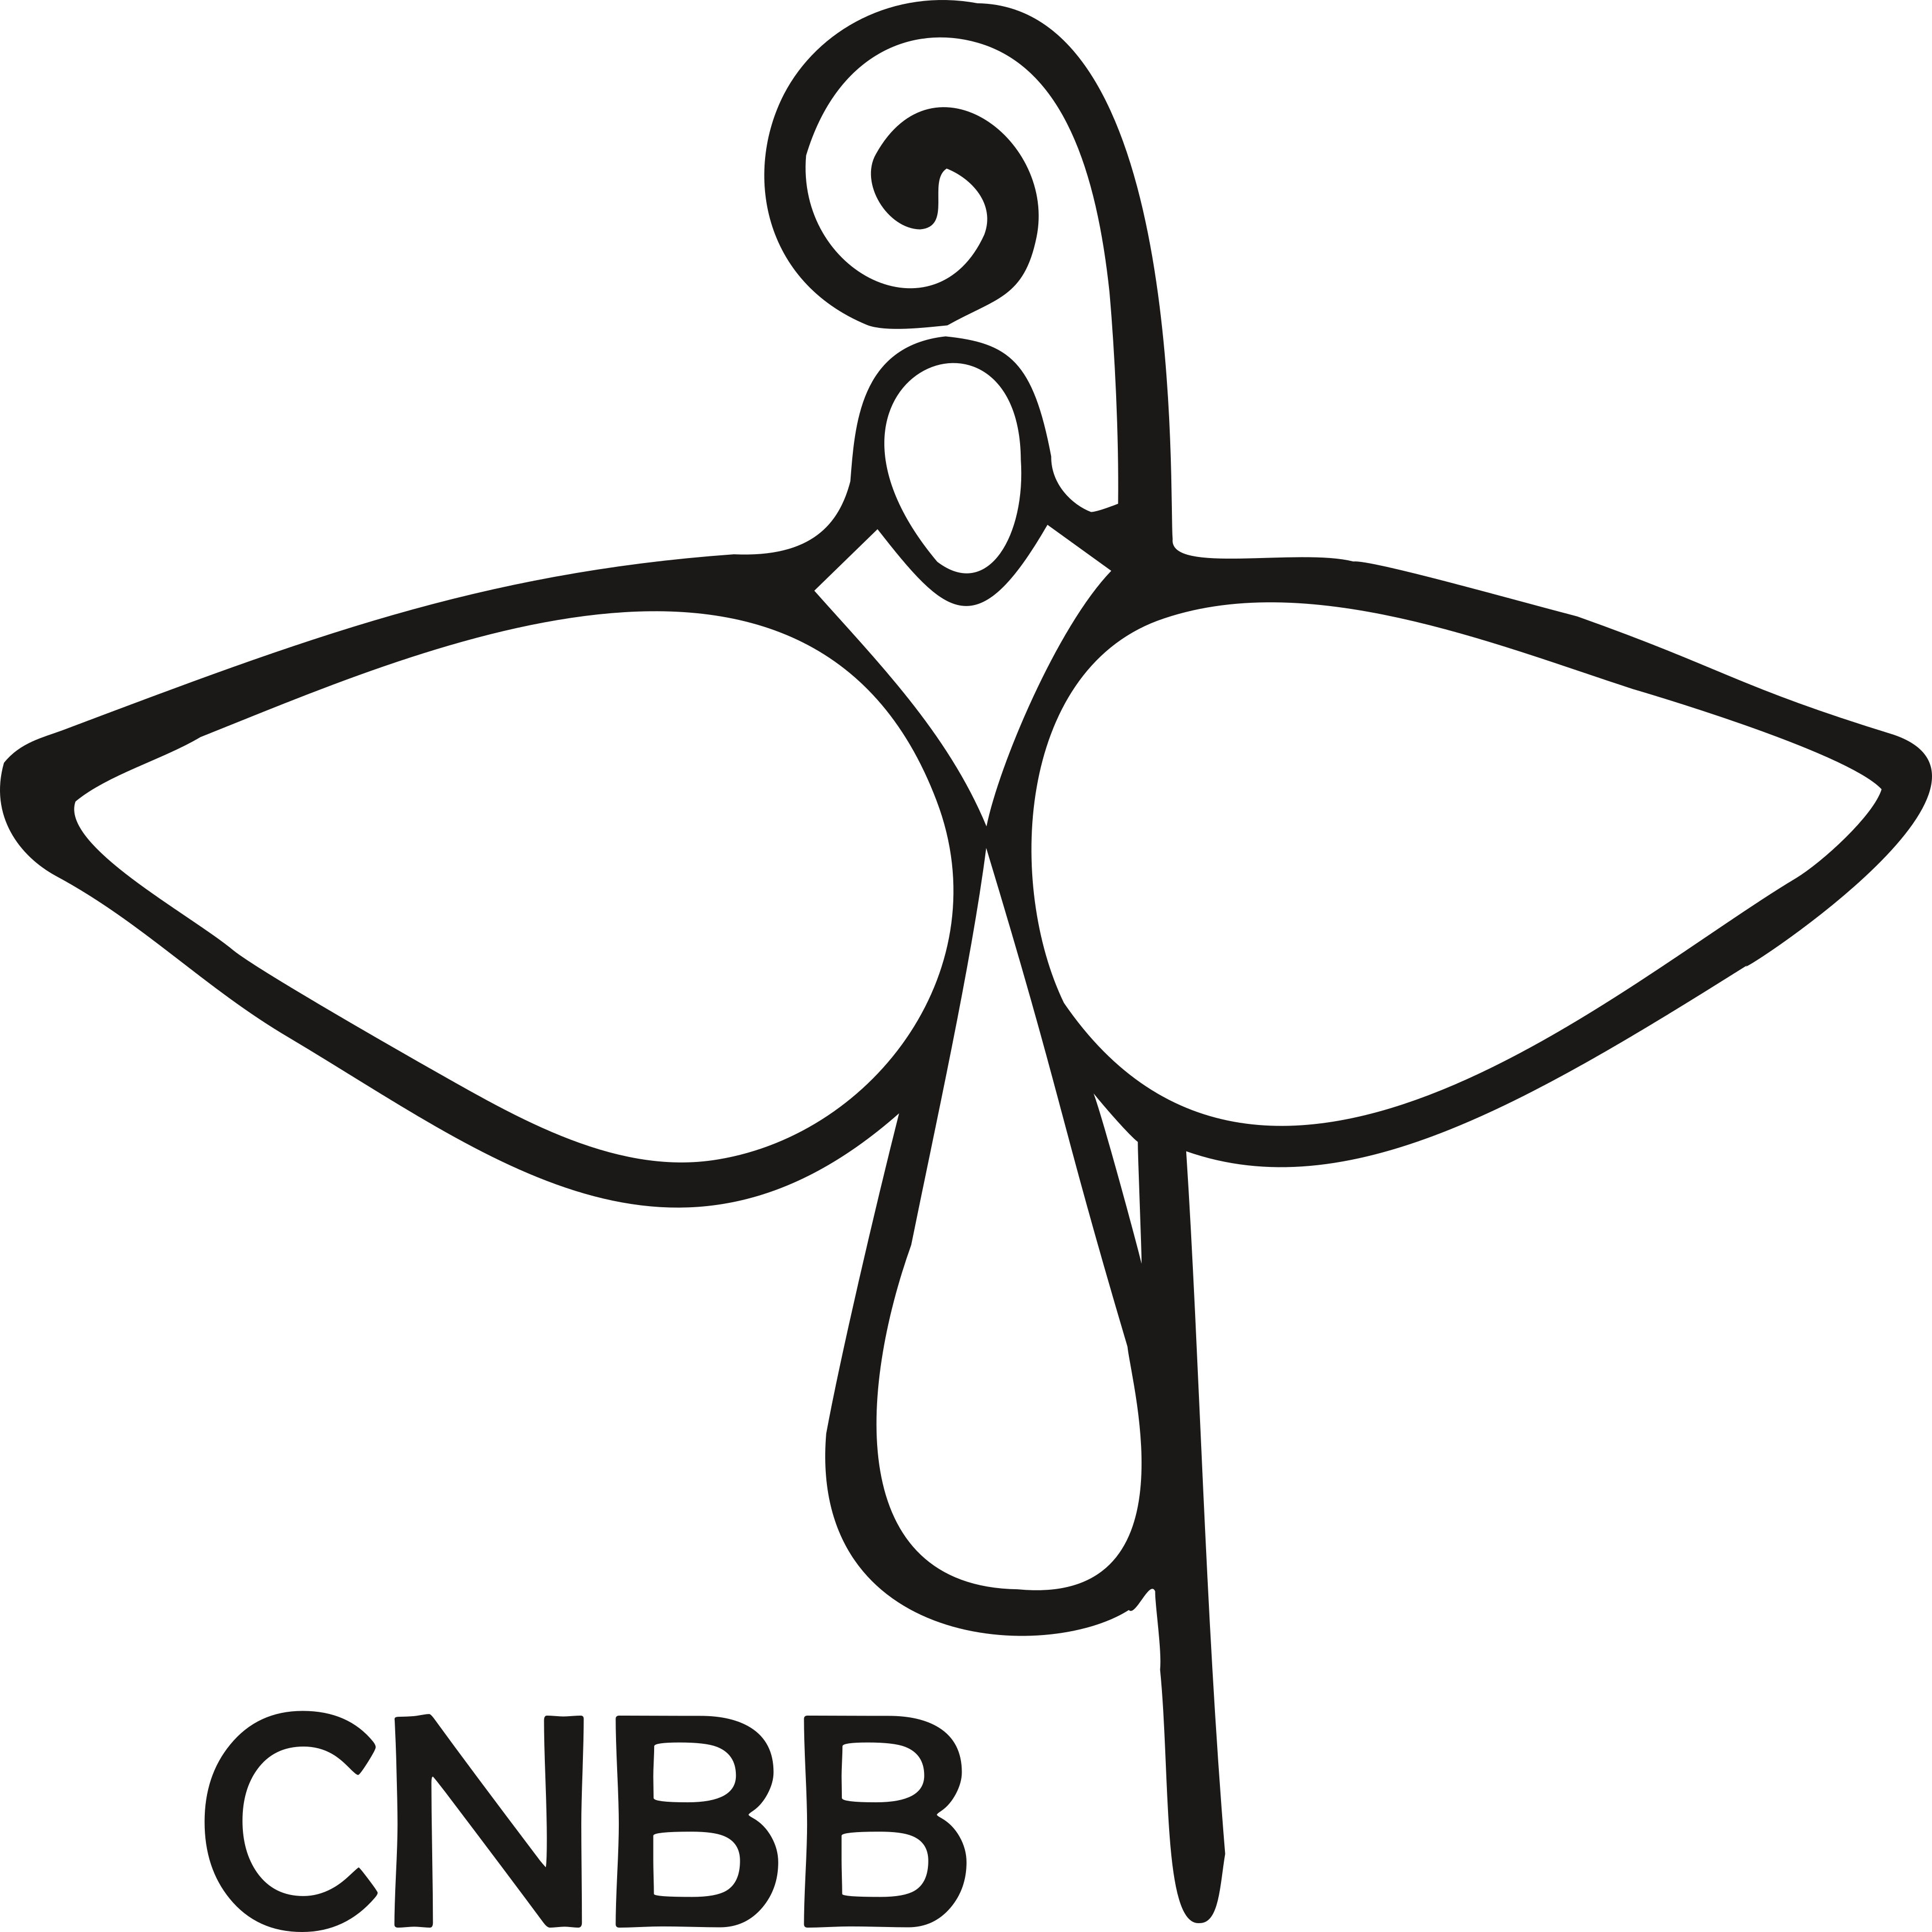 CNBB Logo.